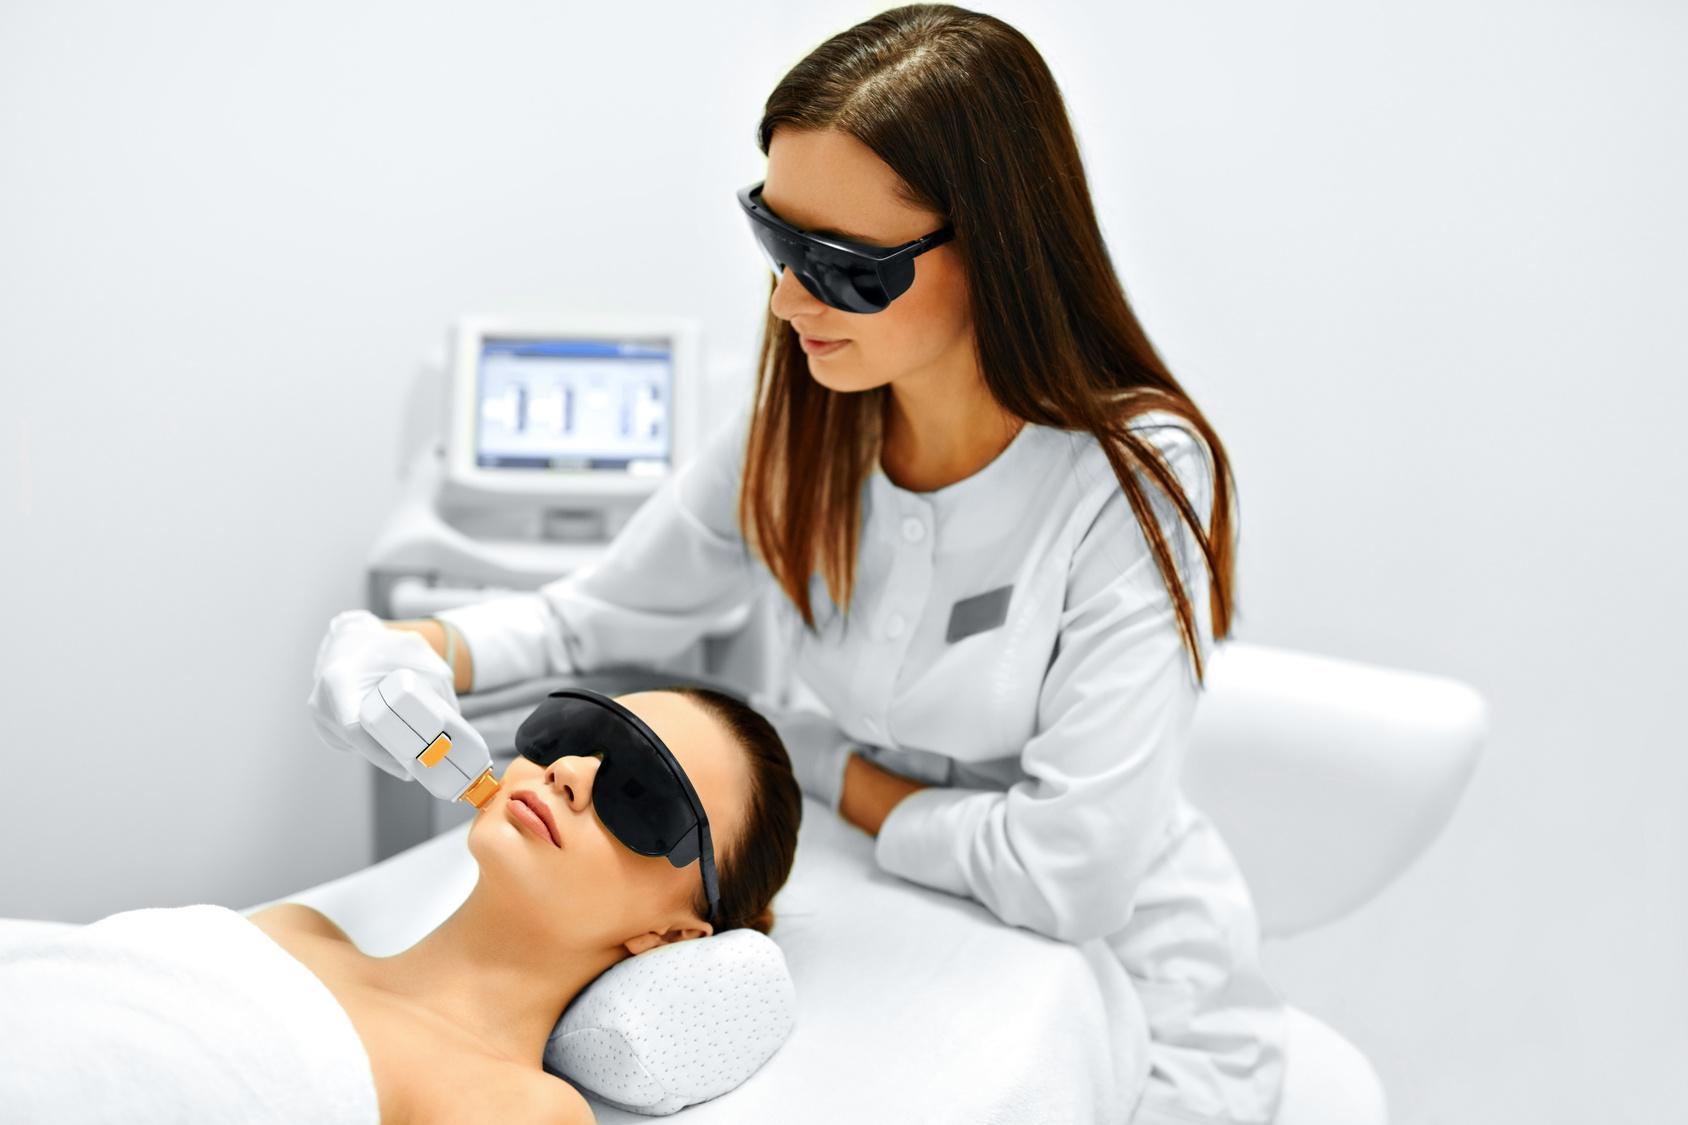 láser dermatologico, láser fraxel